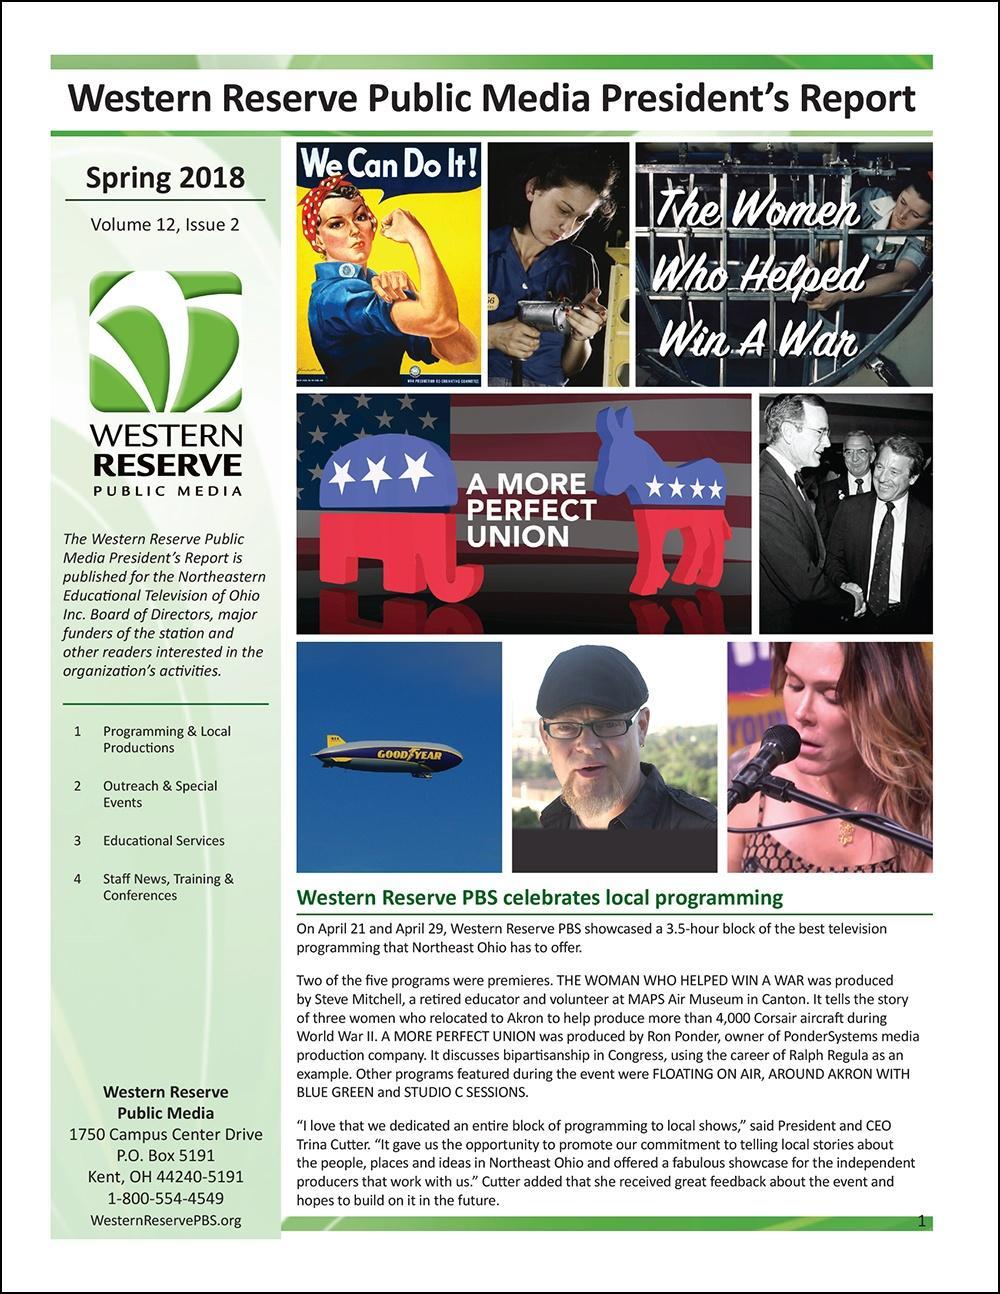 Spring 2018 - Volume 12, Issue 2